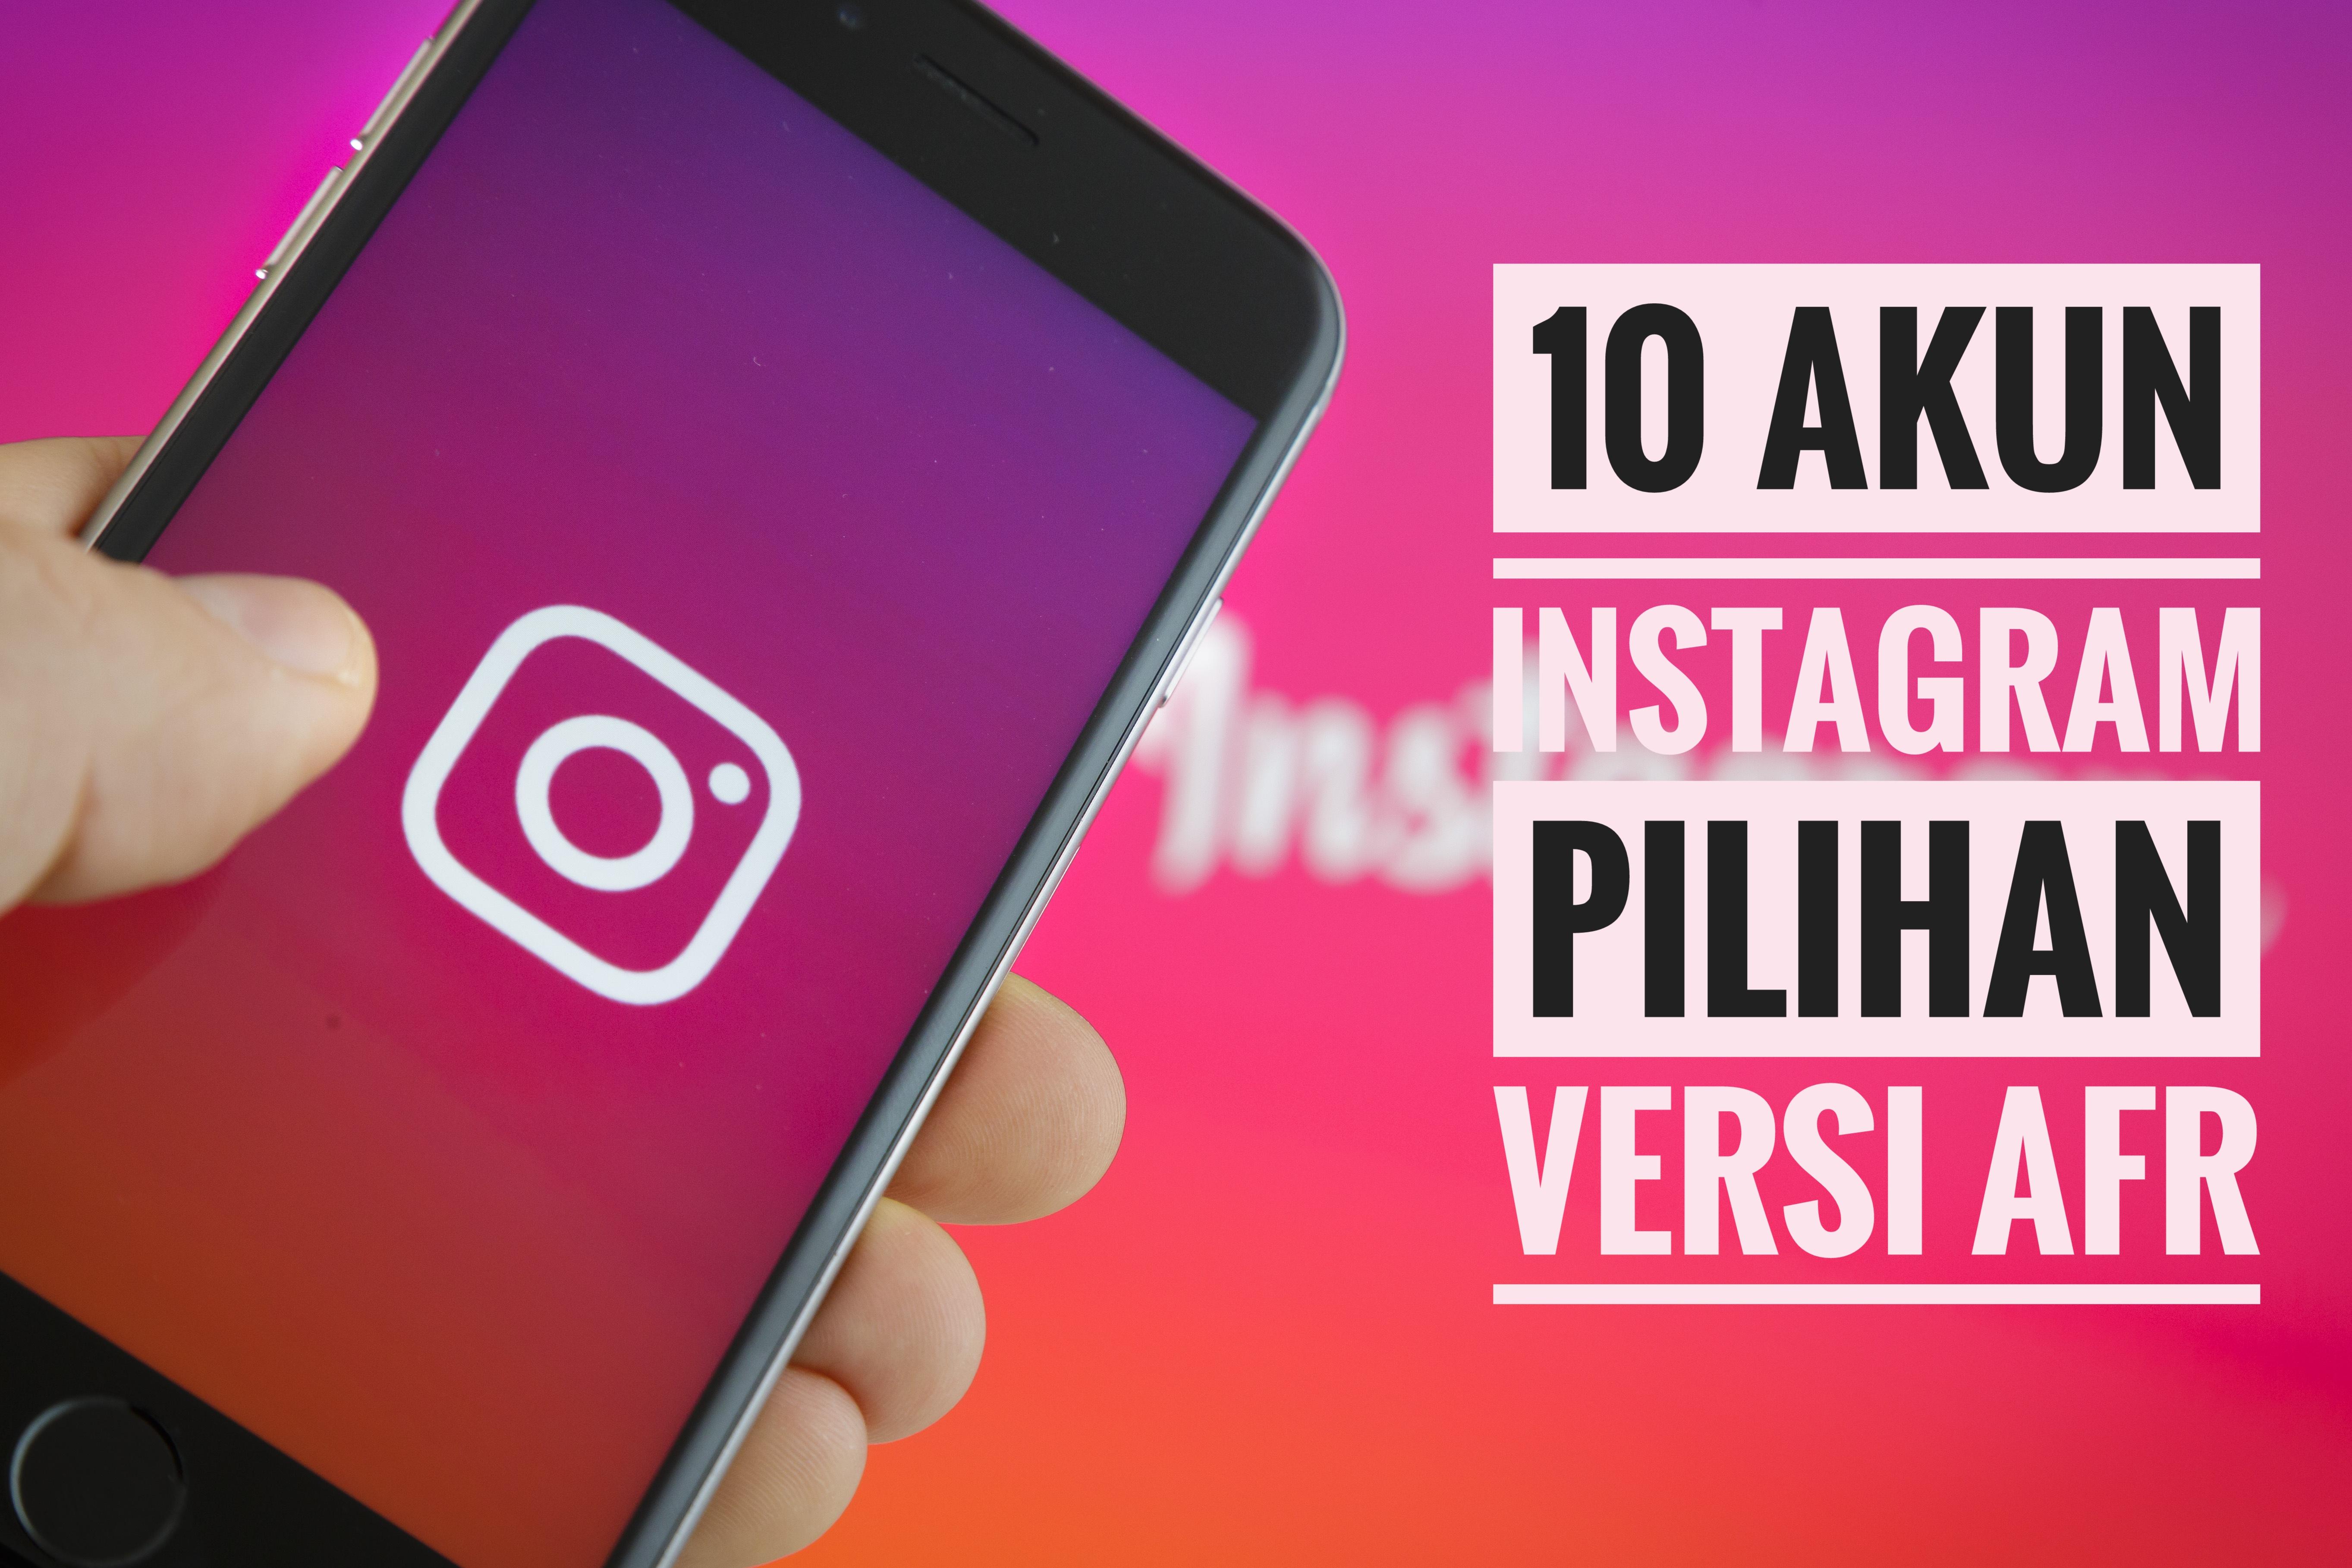 10 Akun Instagram Pilihan Versi AFR